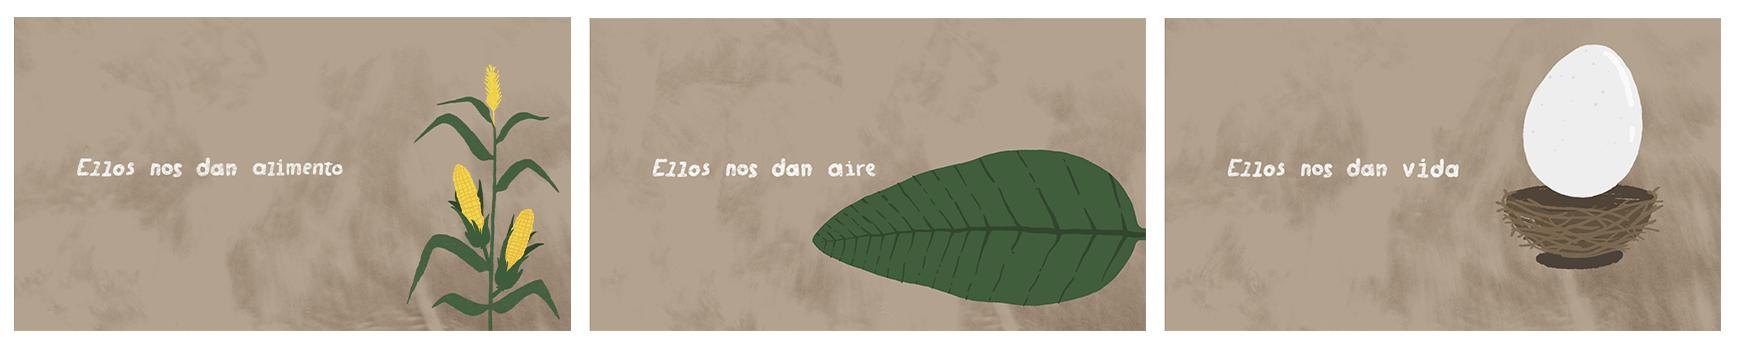 Tú mataste a Berta Cáceres. by Javier Polo García - Creative Work - $i